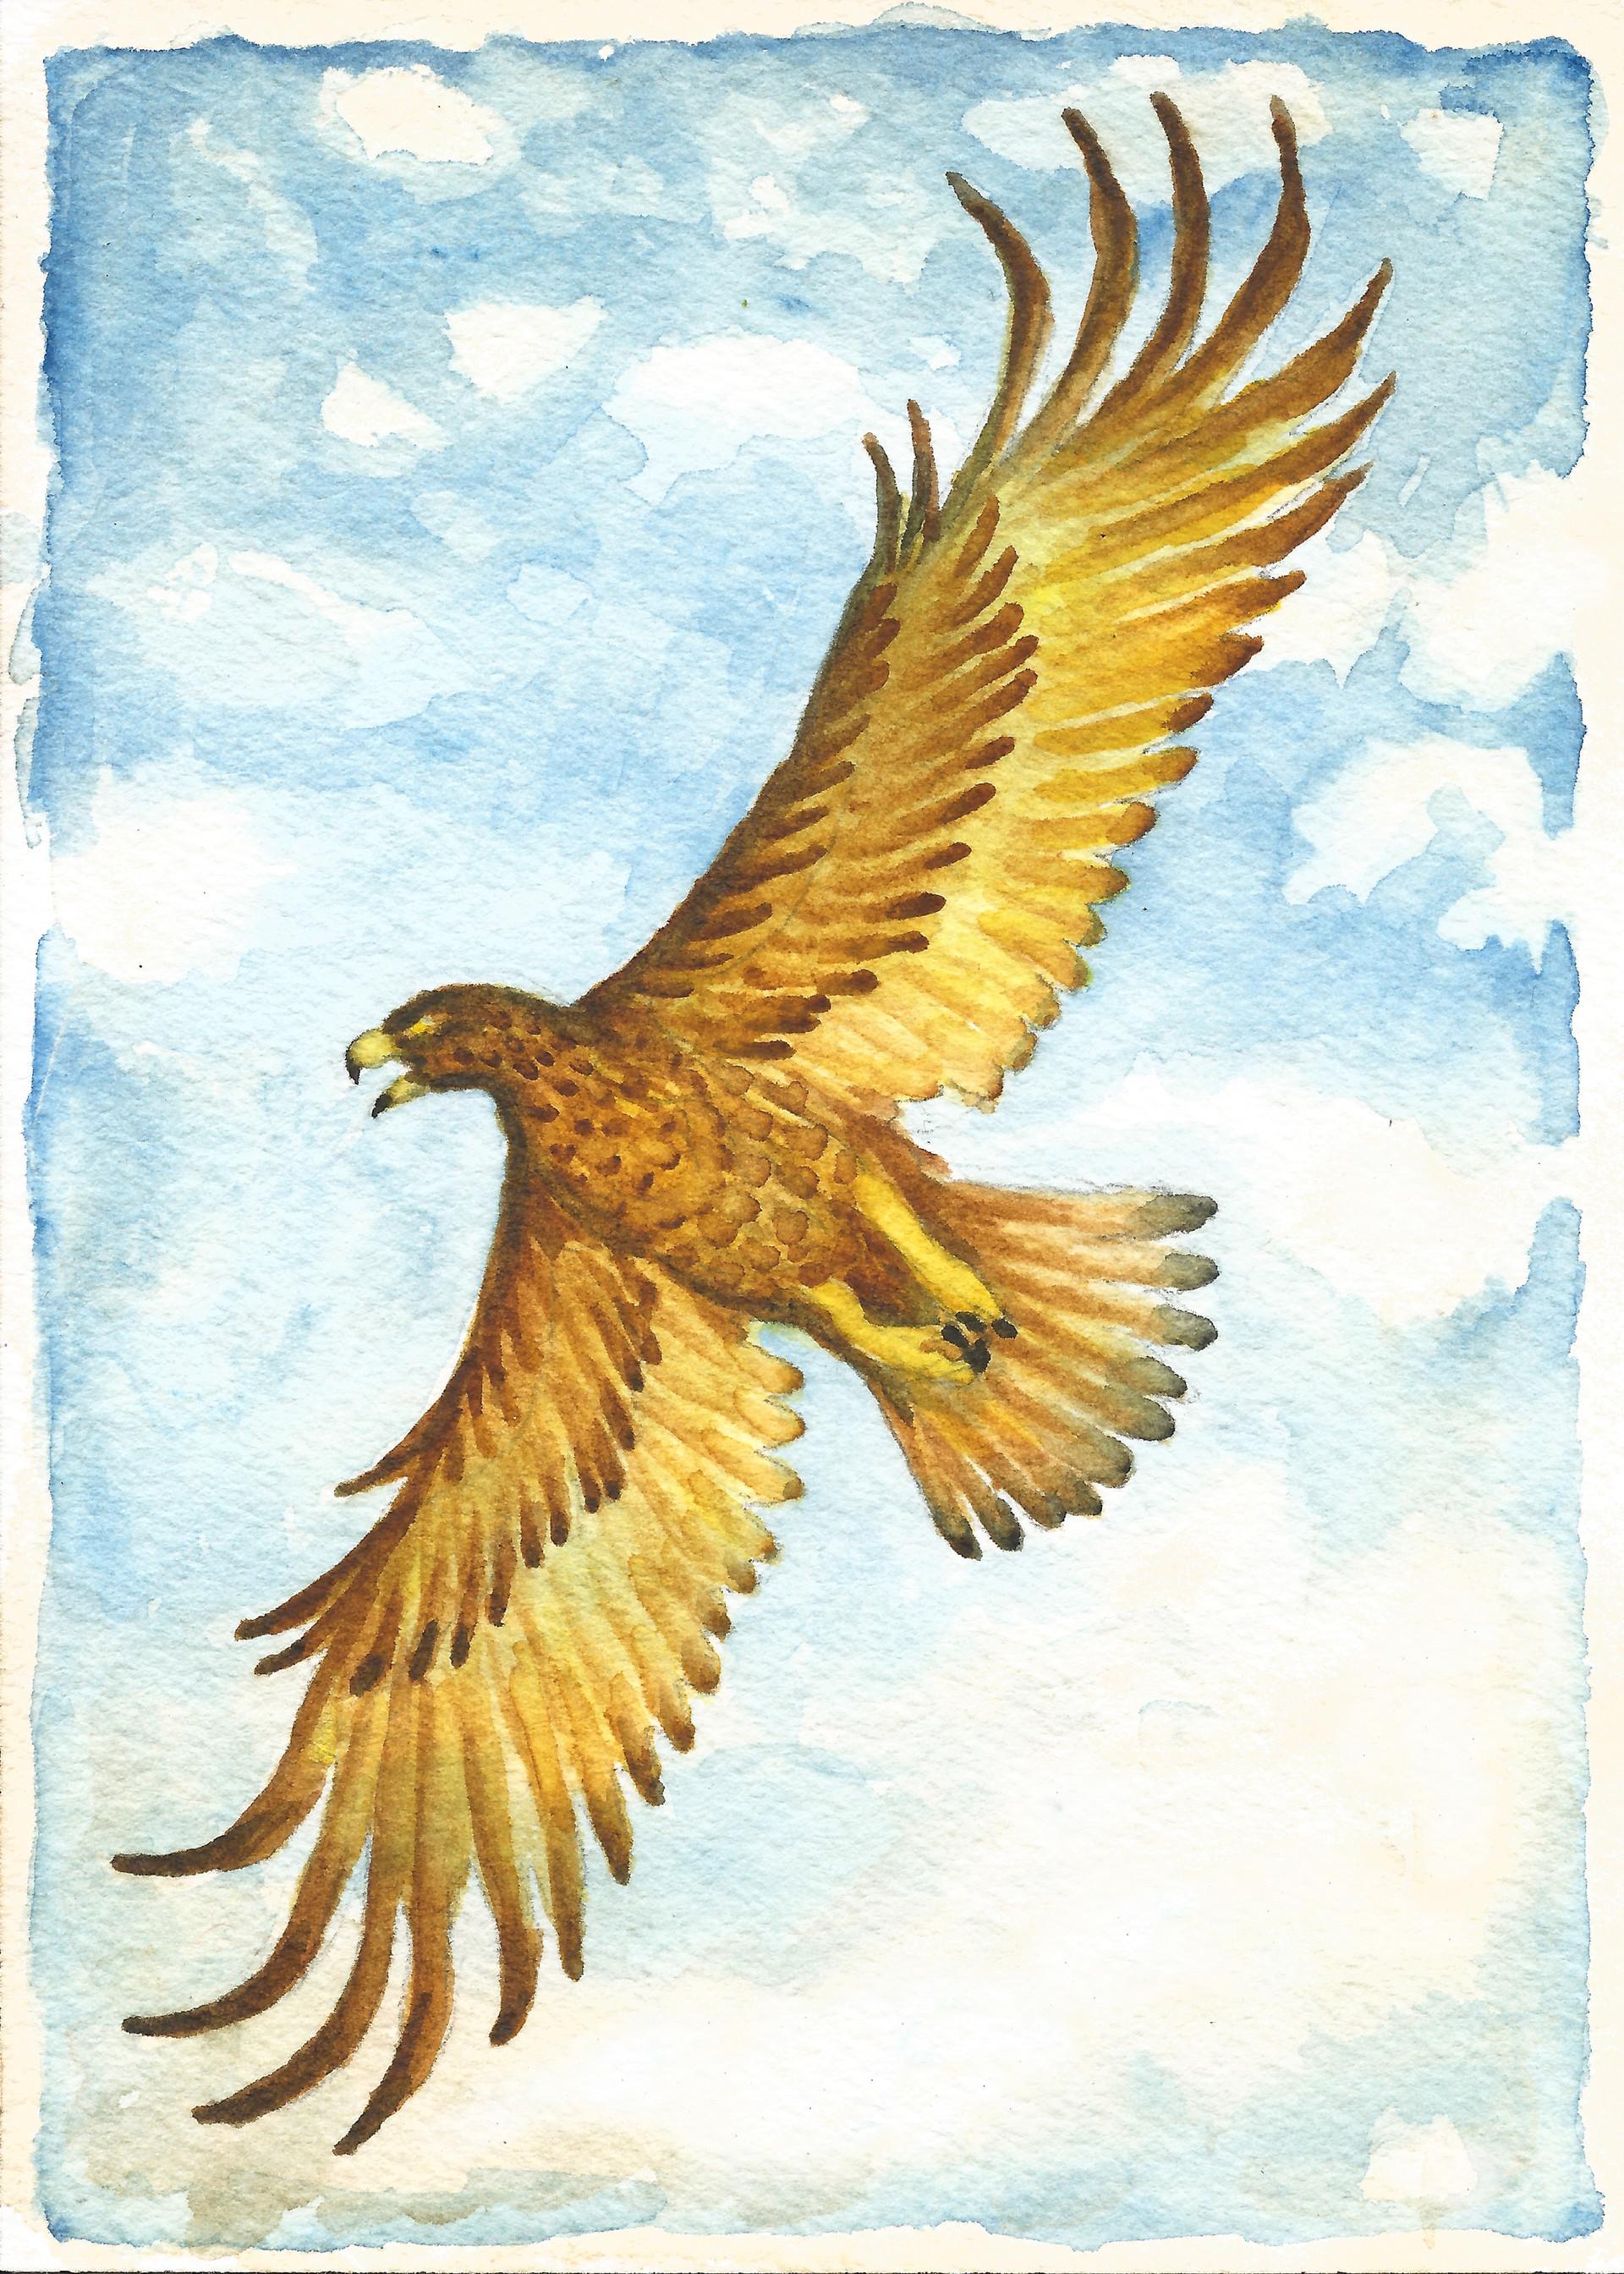 Patrick weck lotr 2 eagle print 2